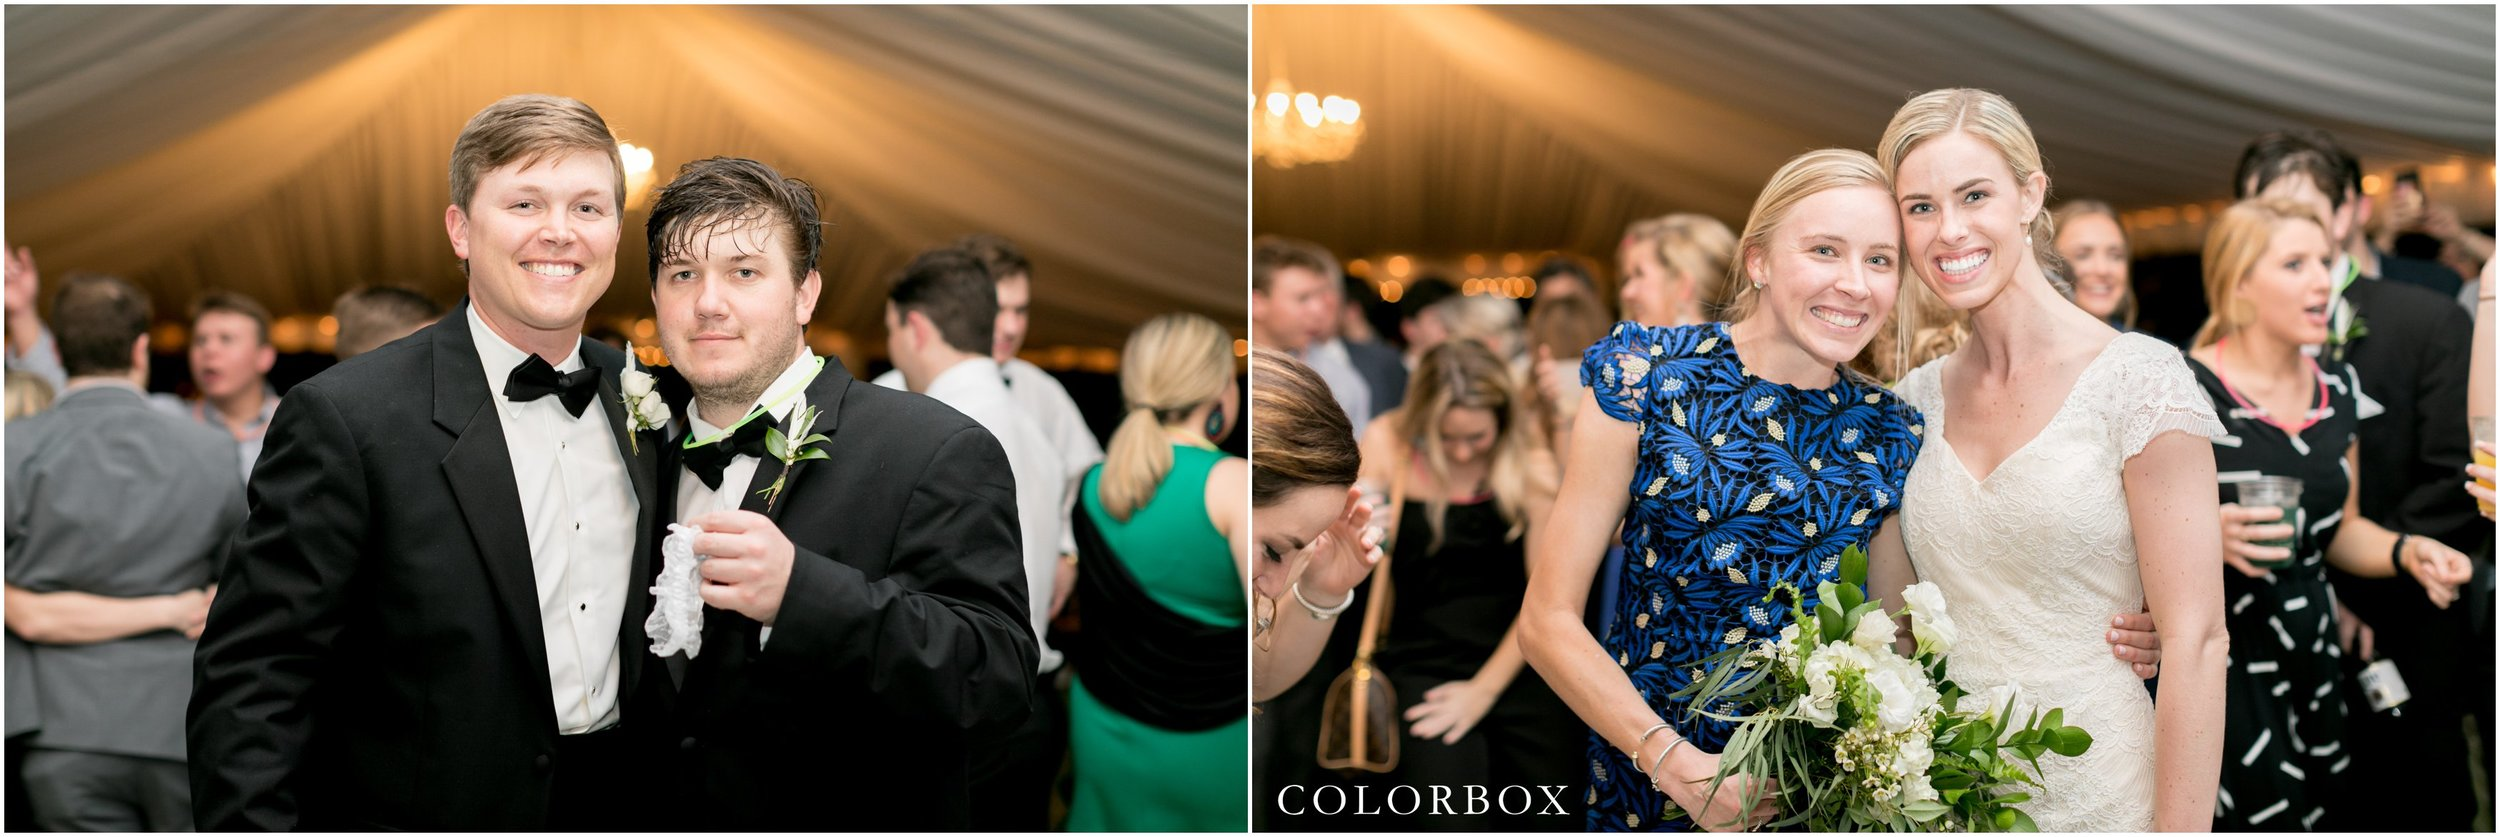 colorboxphotographers_6818.jpg